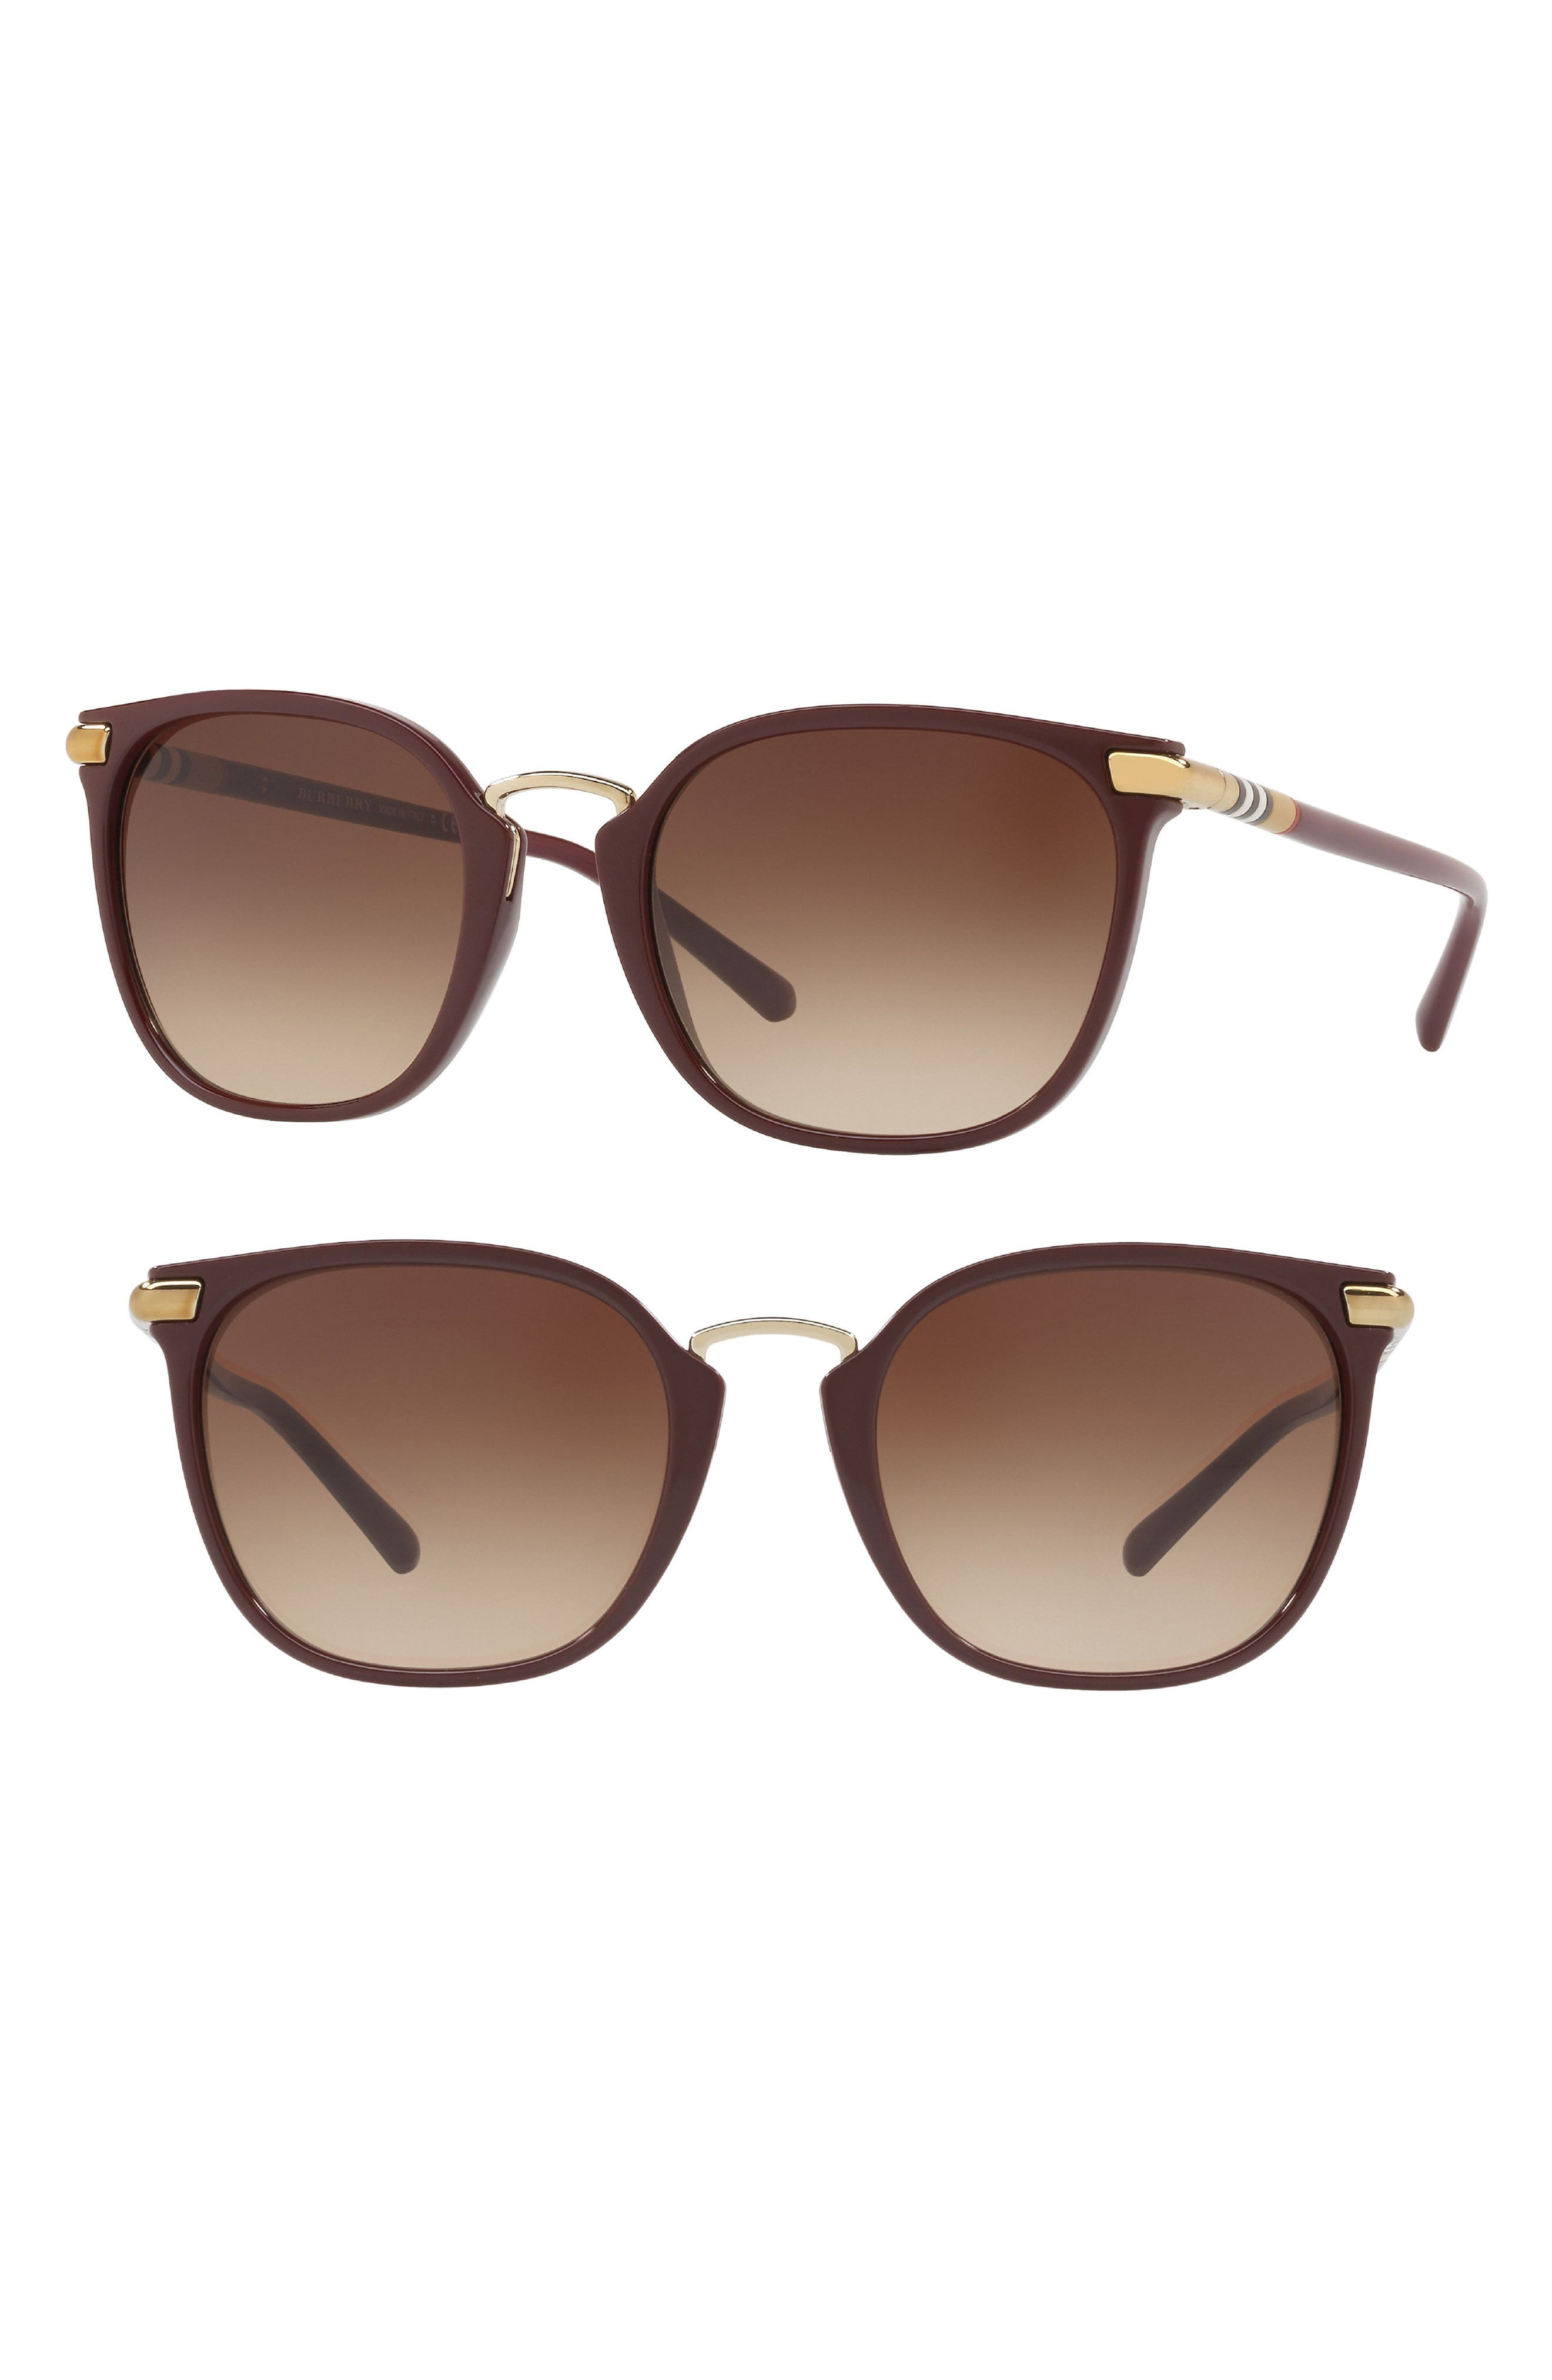 53mm Gradient Square Sunglasses,                             Alternate thumbnail 6, color,